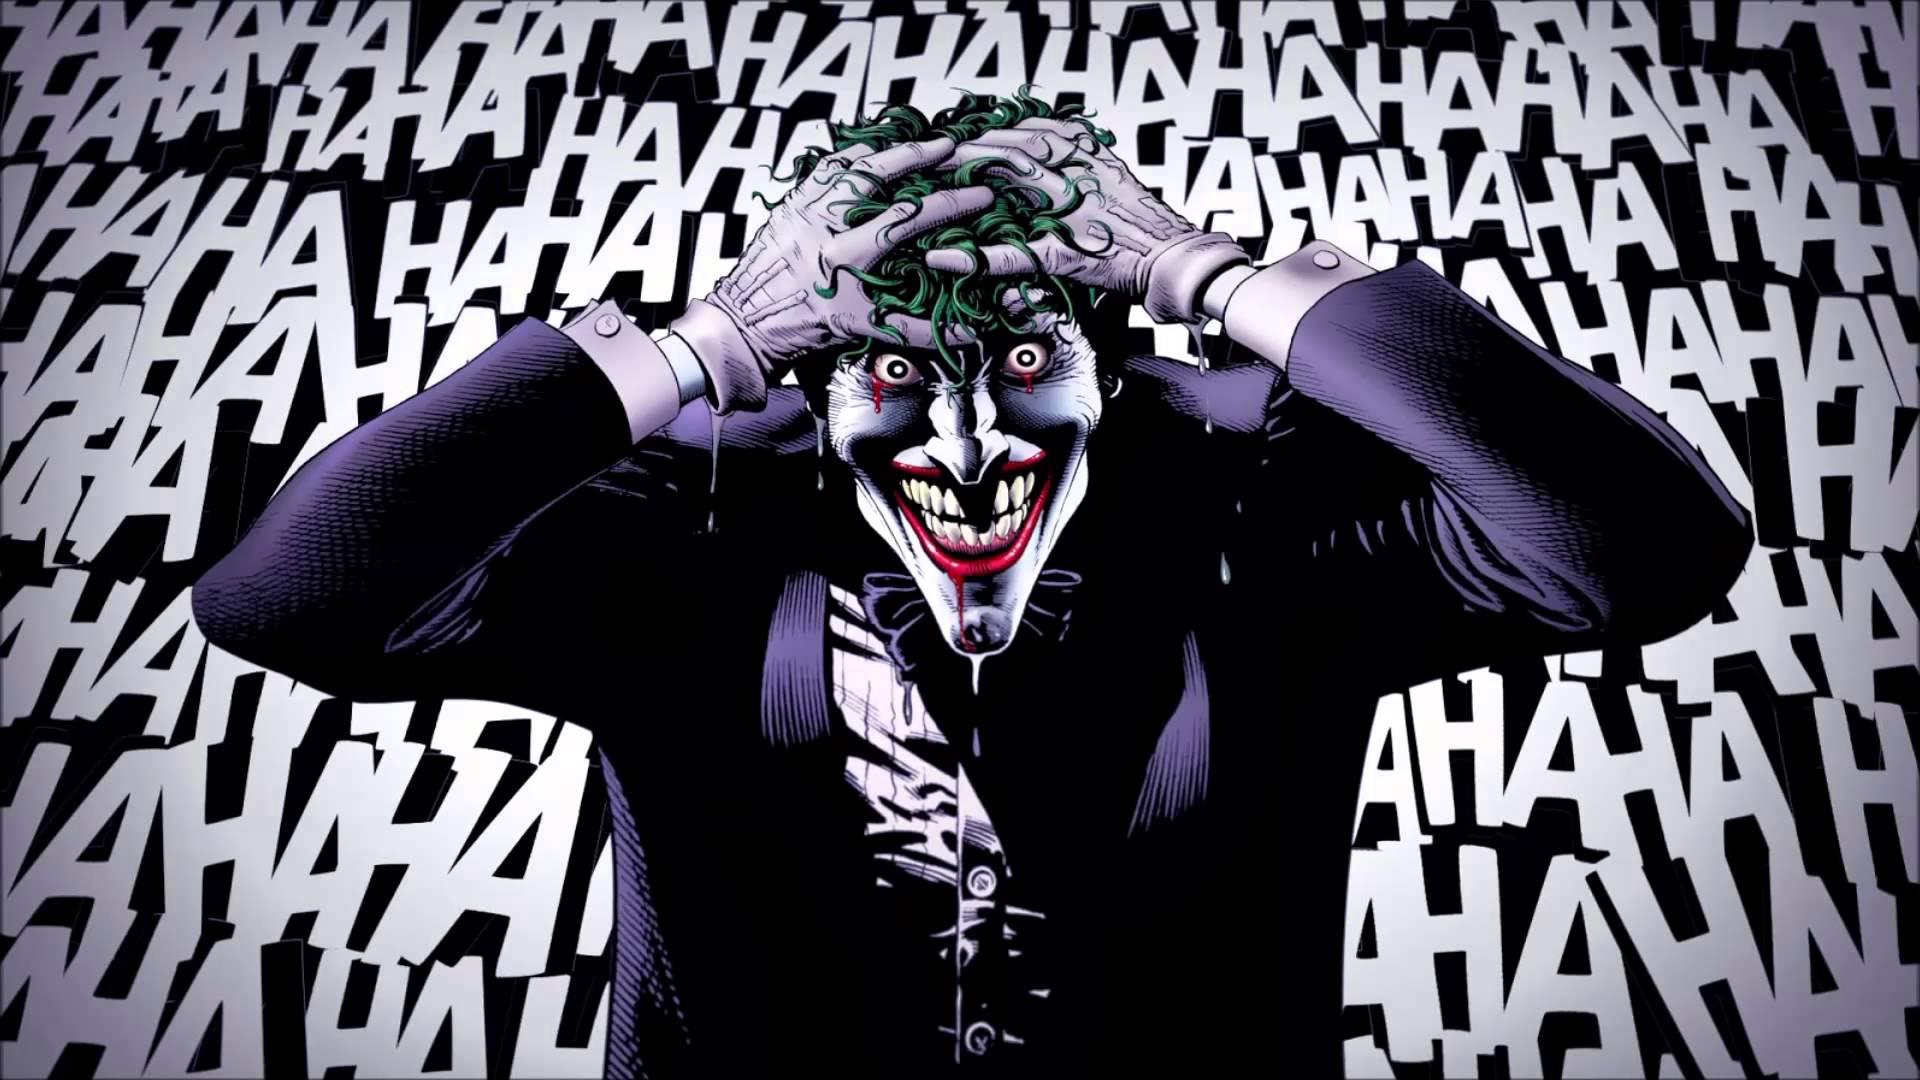 batman-the-killing-joke-animated-film-might-be-rated-r